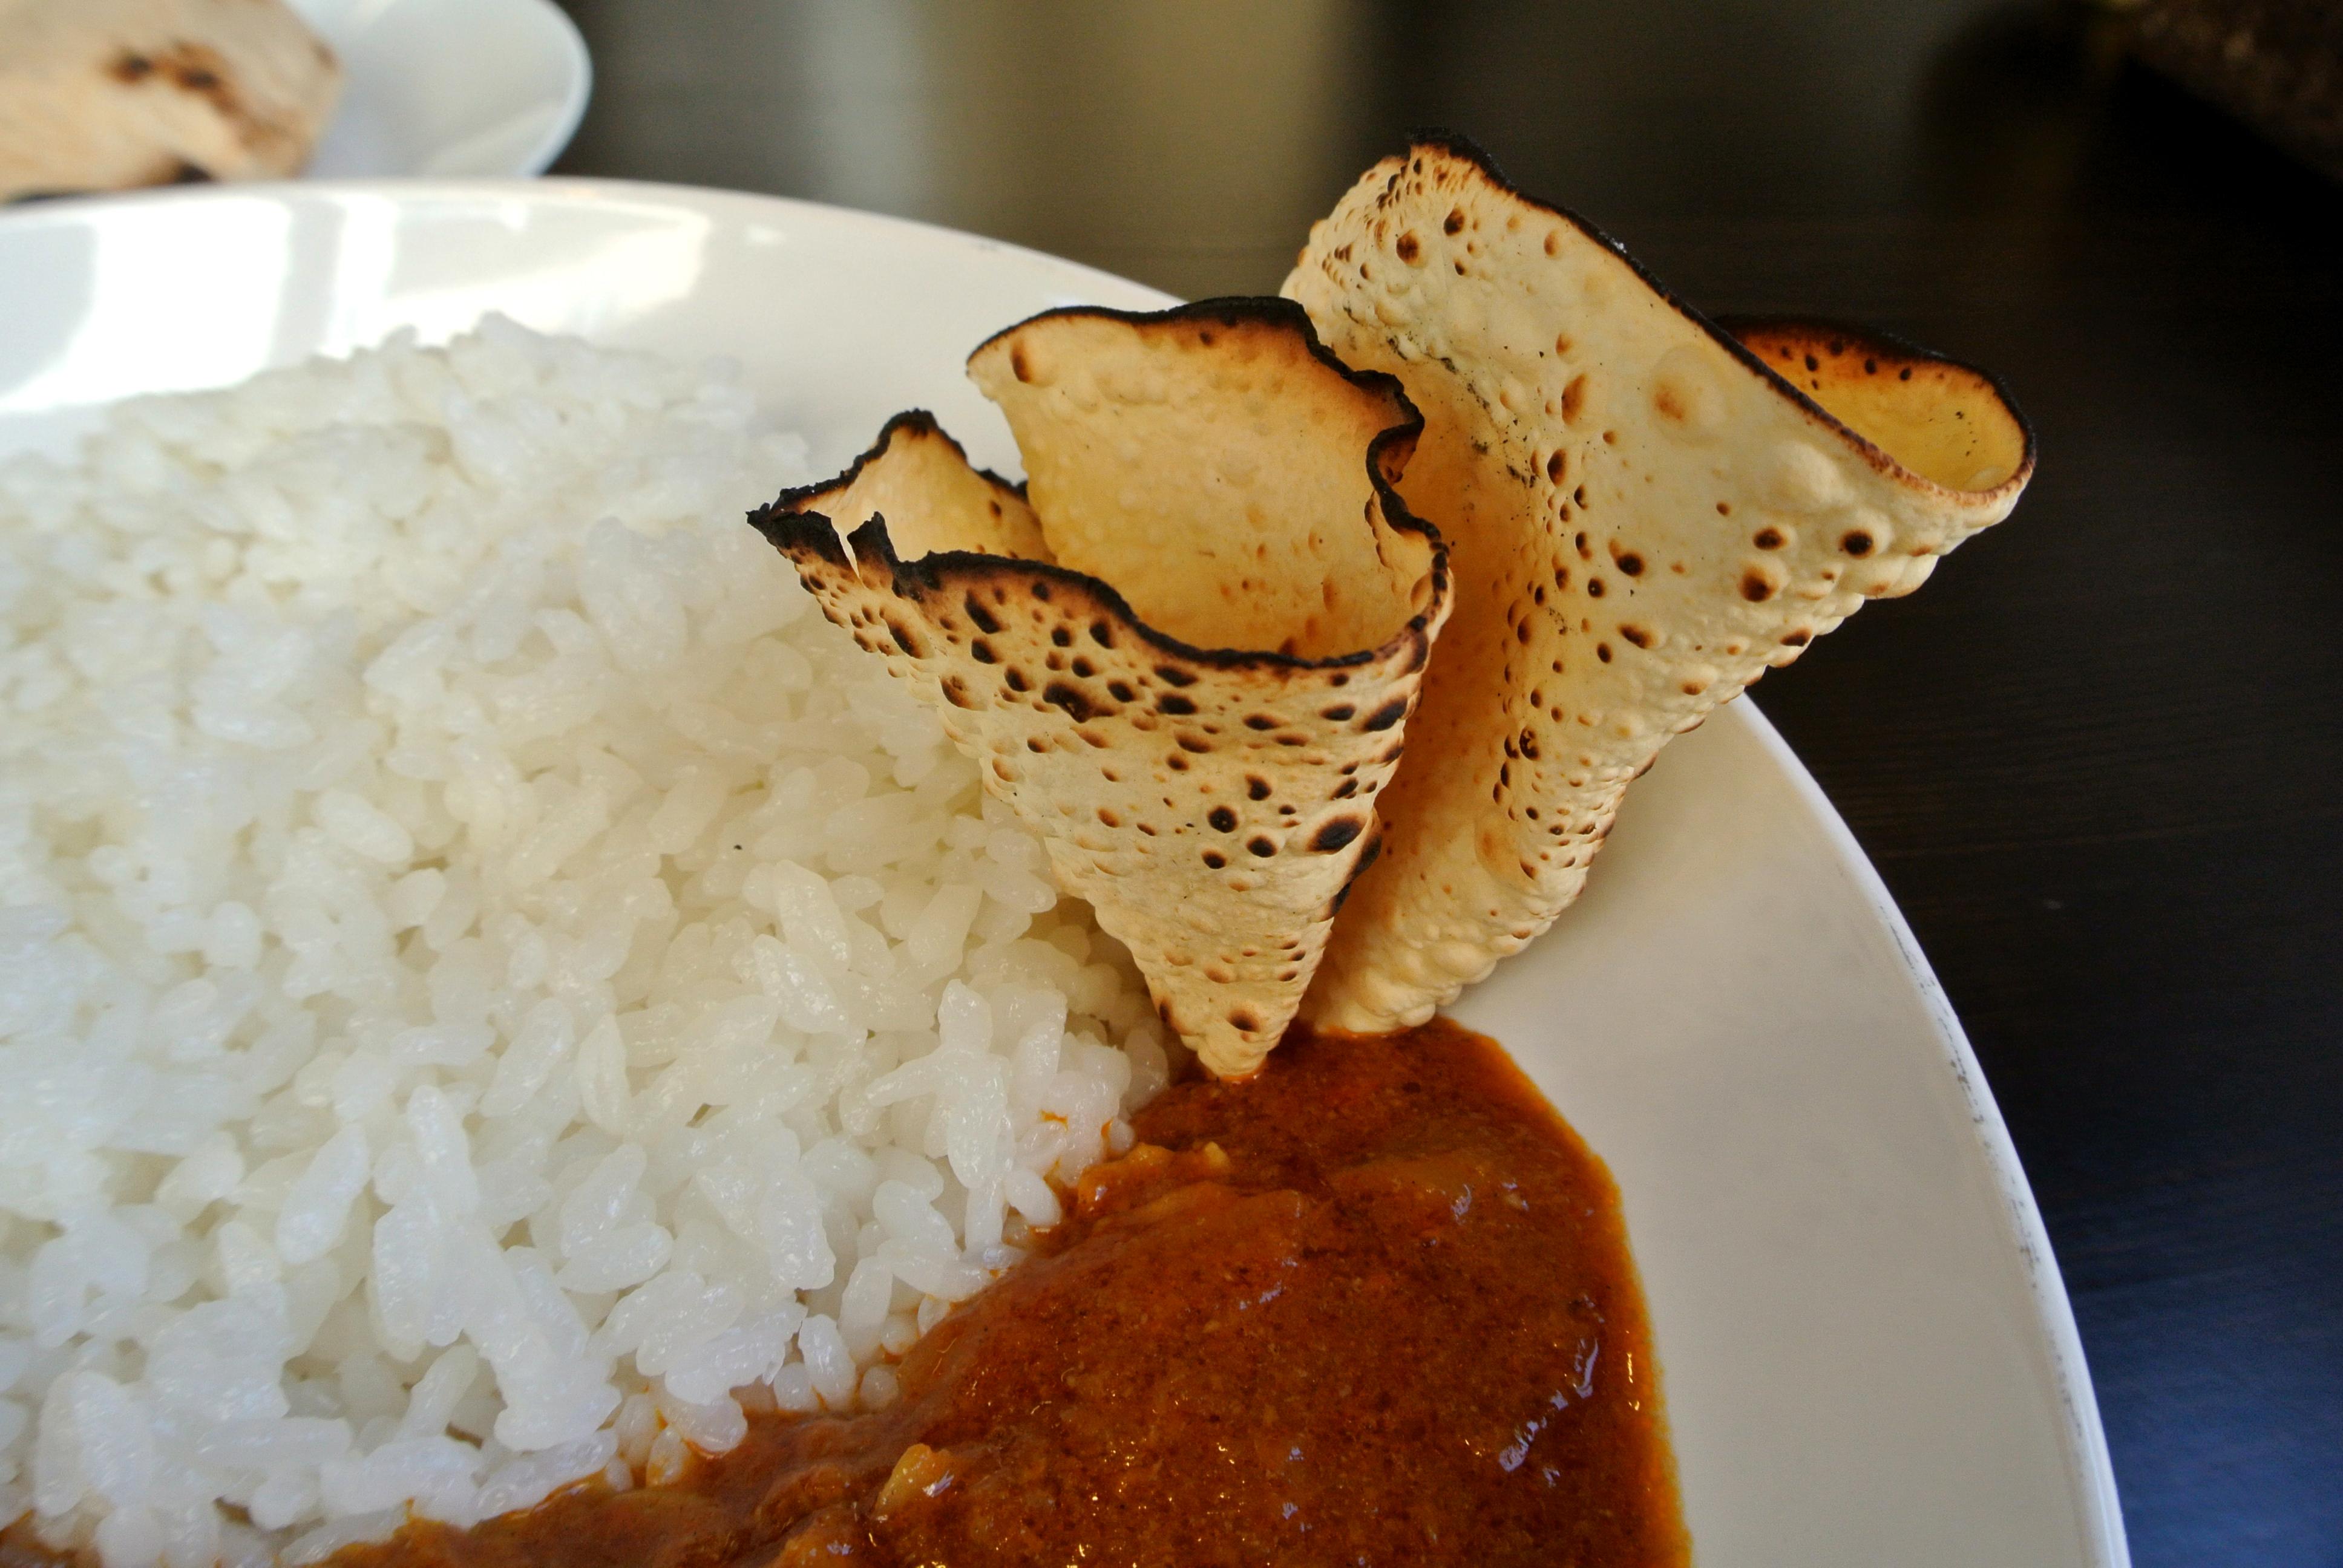 Doon食堂インド山のカレーにつくパパド